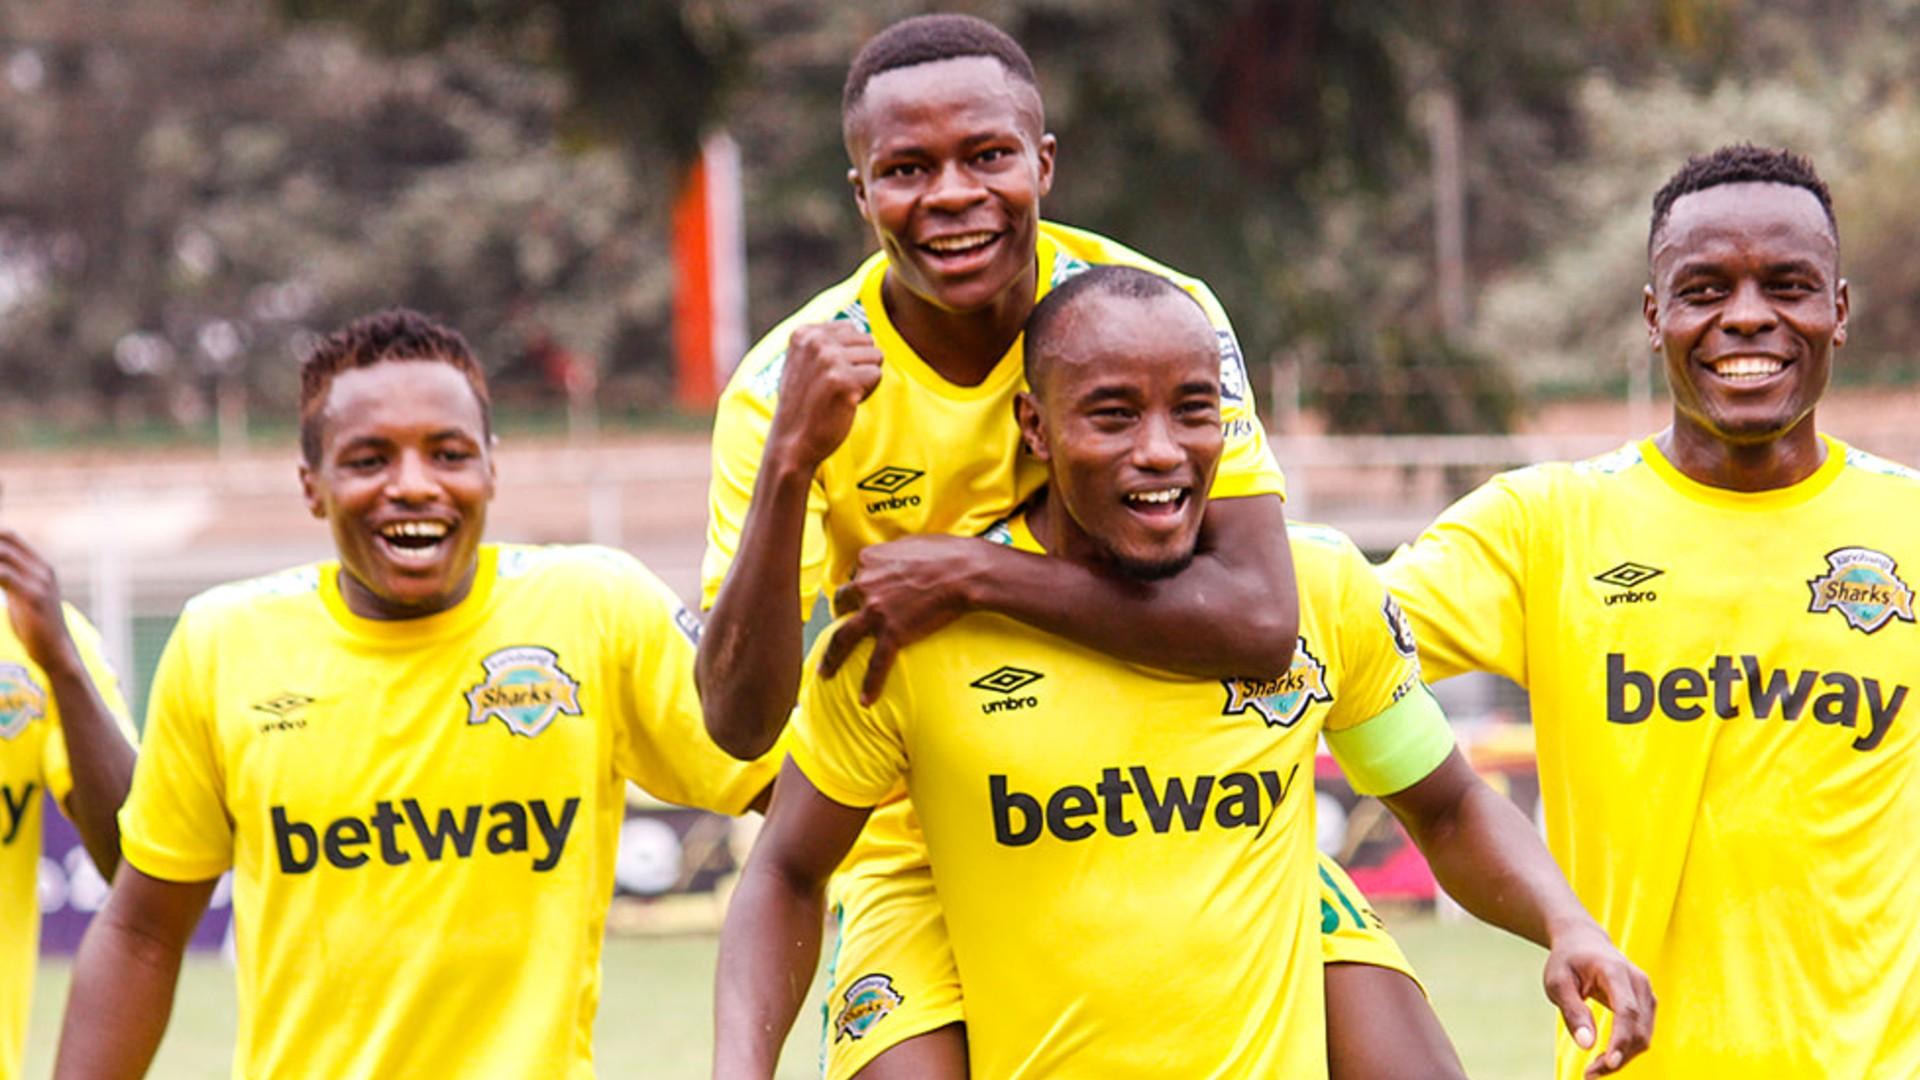 Kariobangi Sharks' Kapaito and all-time top scorers in FKF Premier League